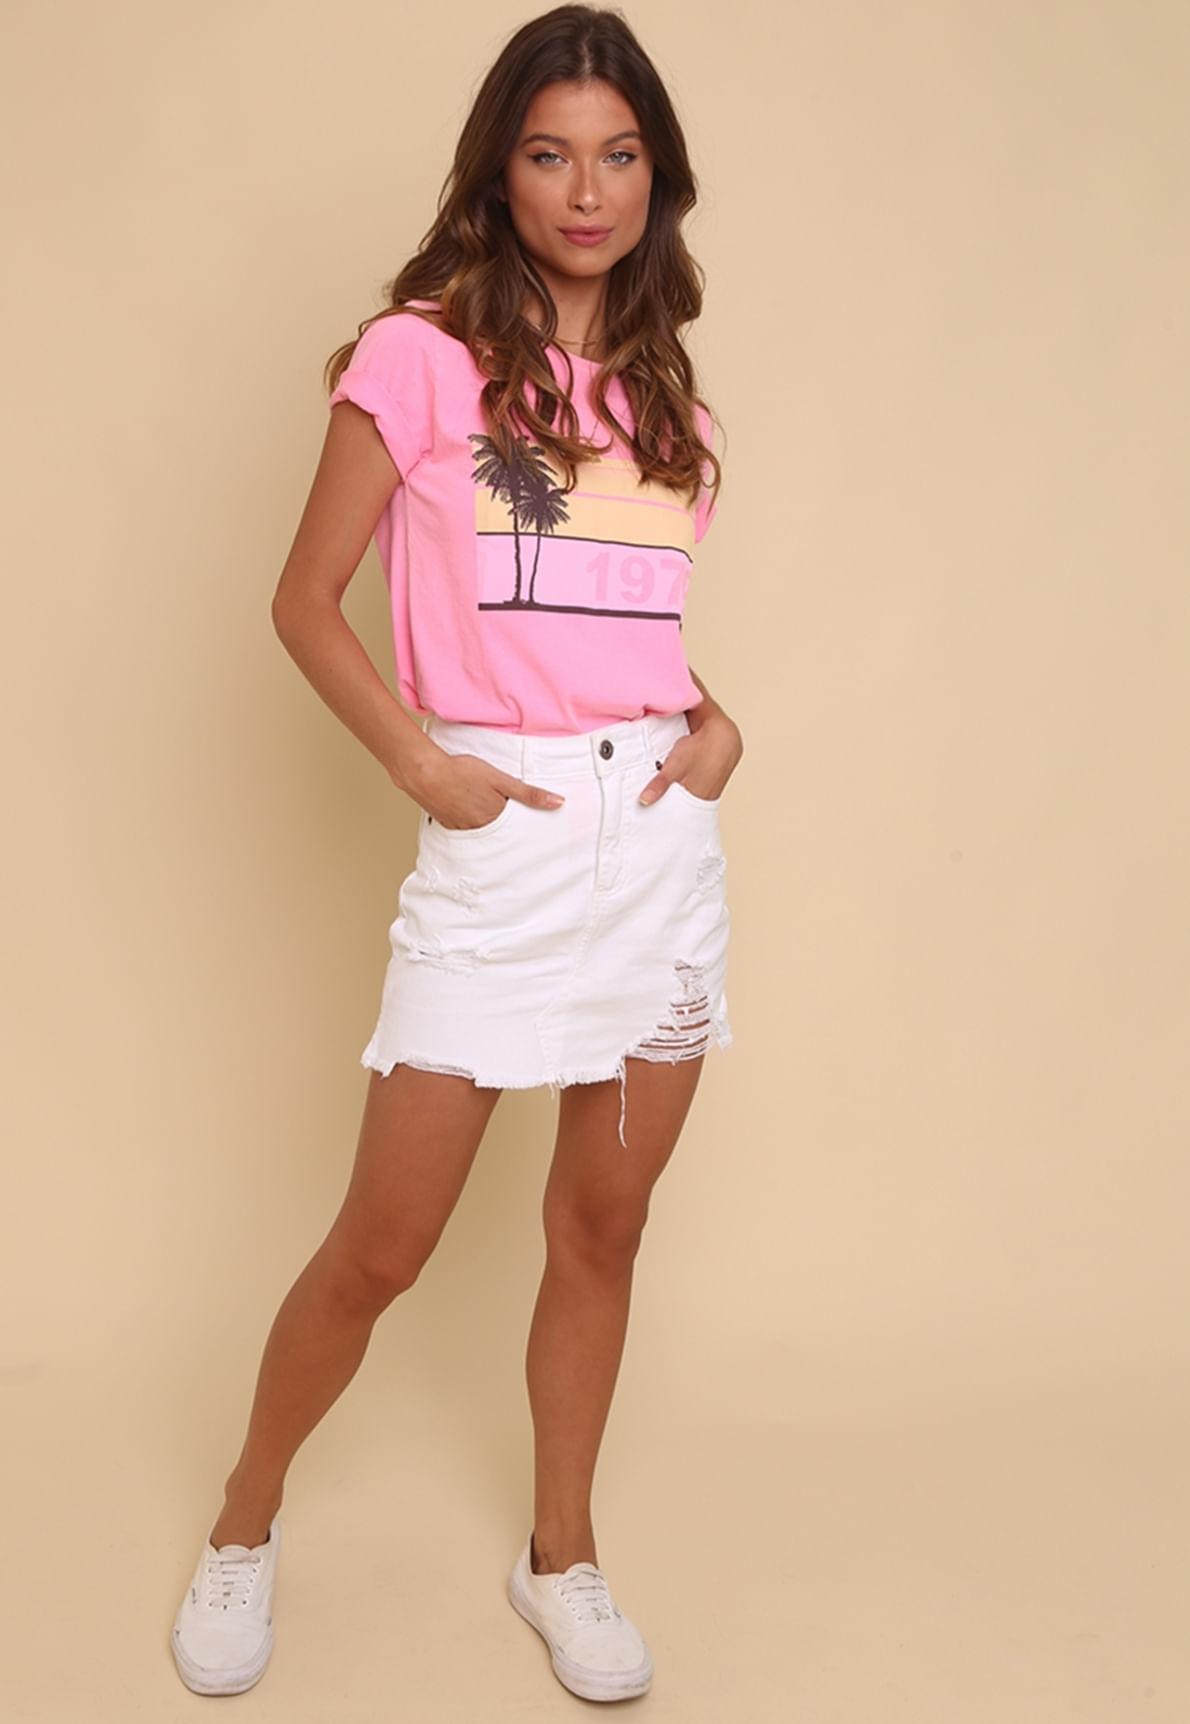 27679-t-shirt-rosa-1970-mundo-lolita-03